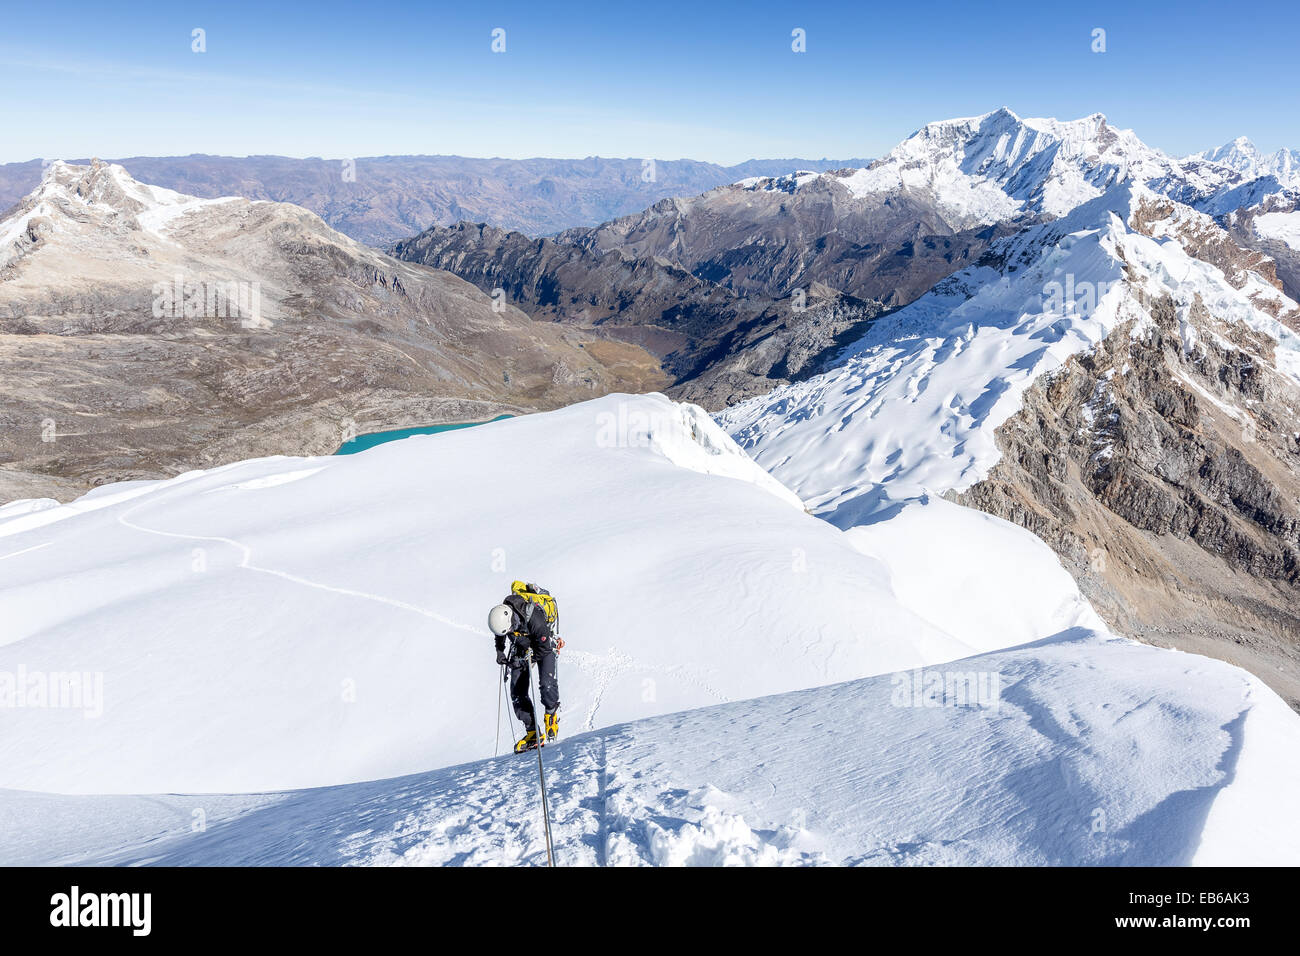 Rappelling from Tocllaraju (6032m), Ishinca valley, Cordillera Blanca, Andes, Peru, South America - Stock Image